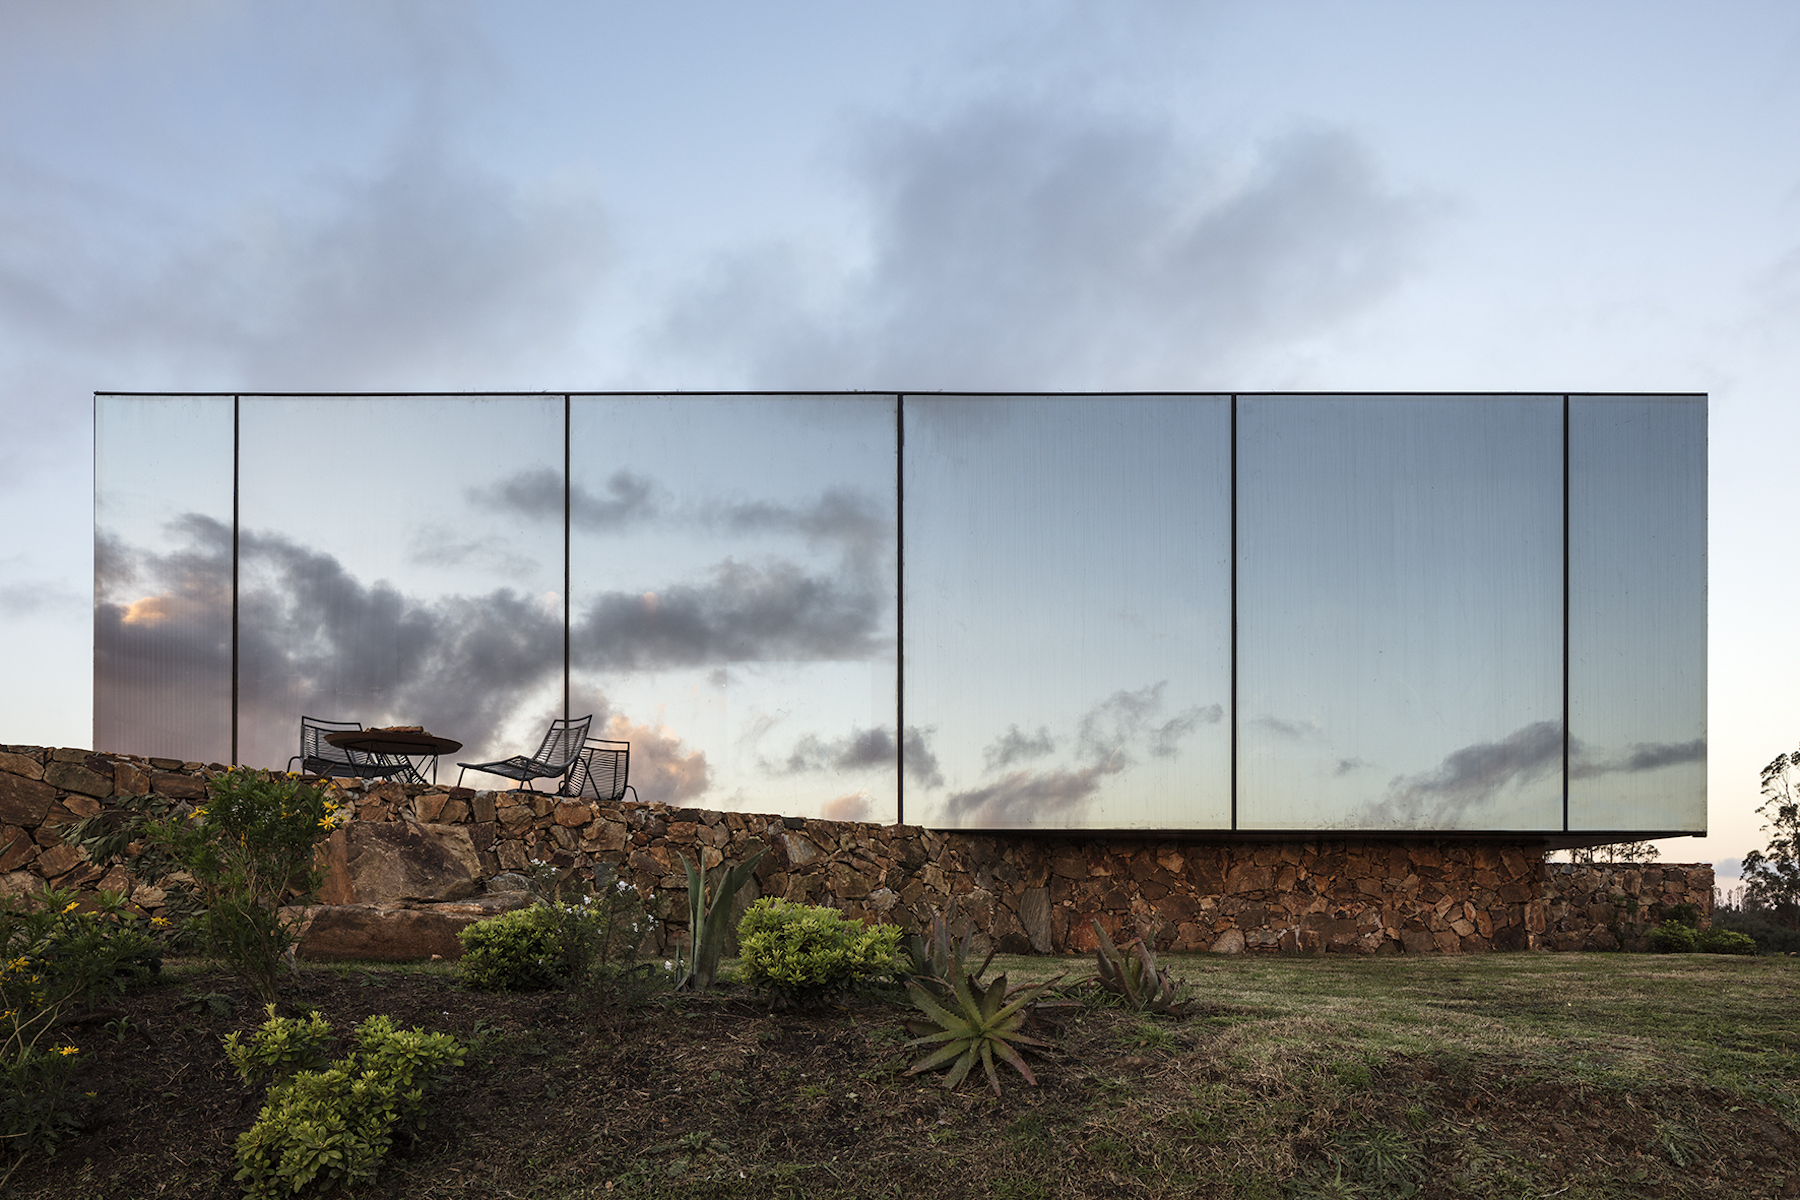 Sacromonte Hotel by MAPA architects. Example of Landscape architecturE. Image by Leonardo Finotti